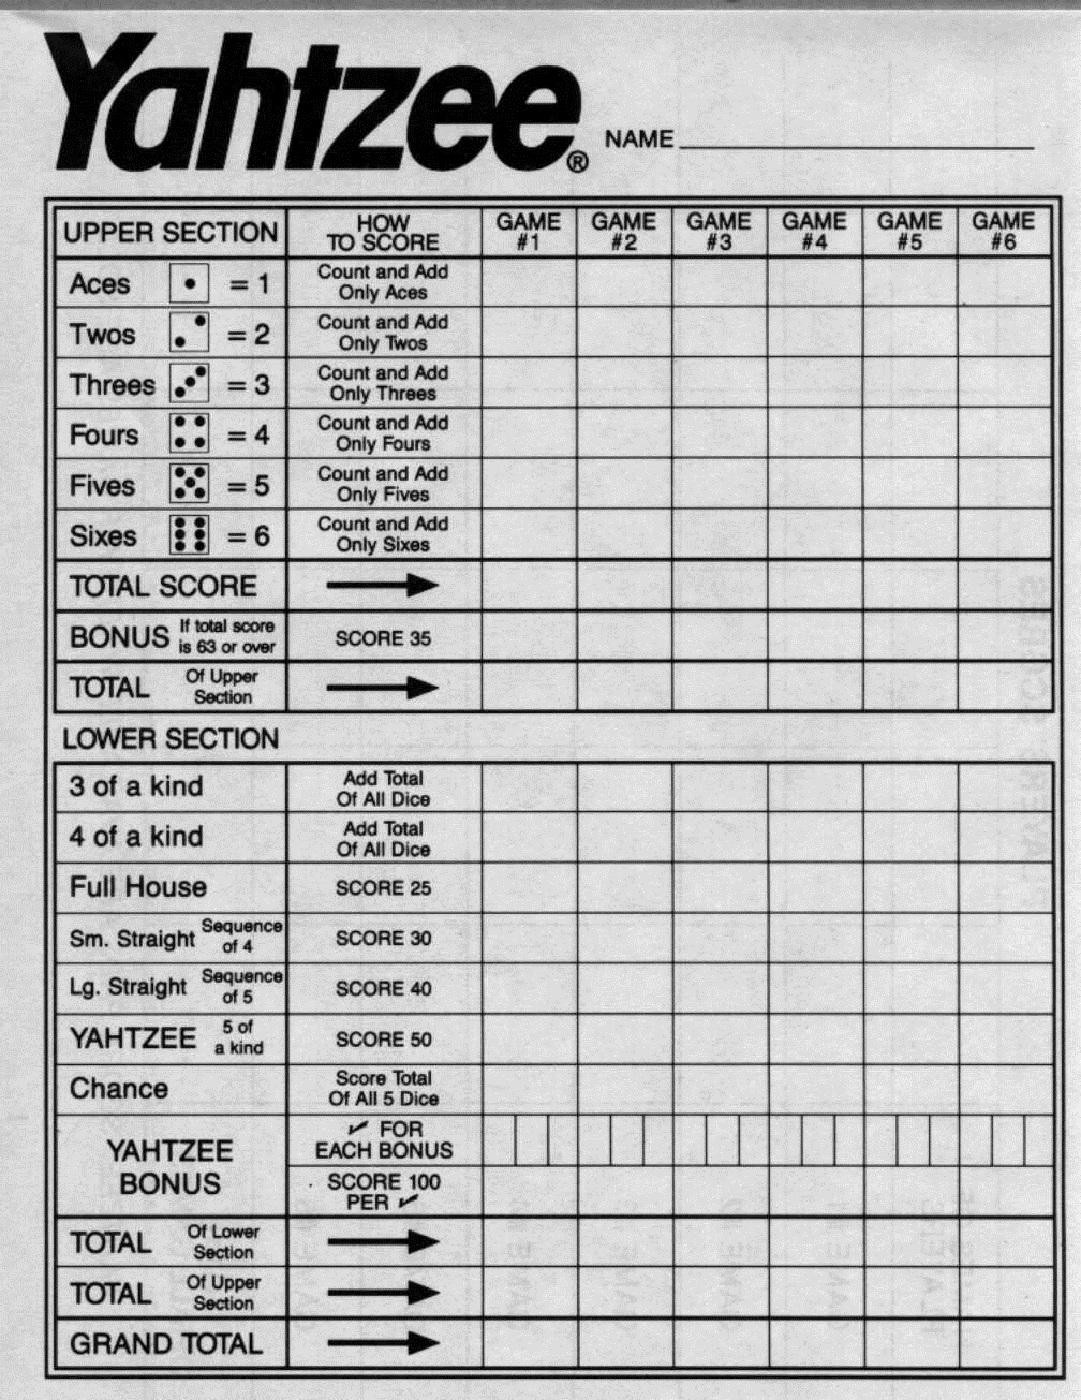 graphic regarding Printable Yahtzee Score Sheet called Yahtzee Rating Sheets - Resume Illustrations Resume Template